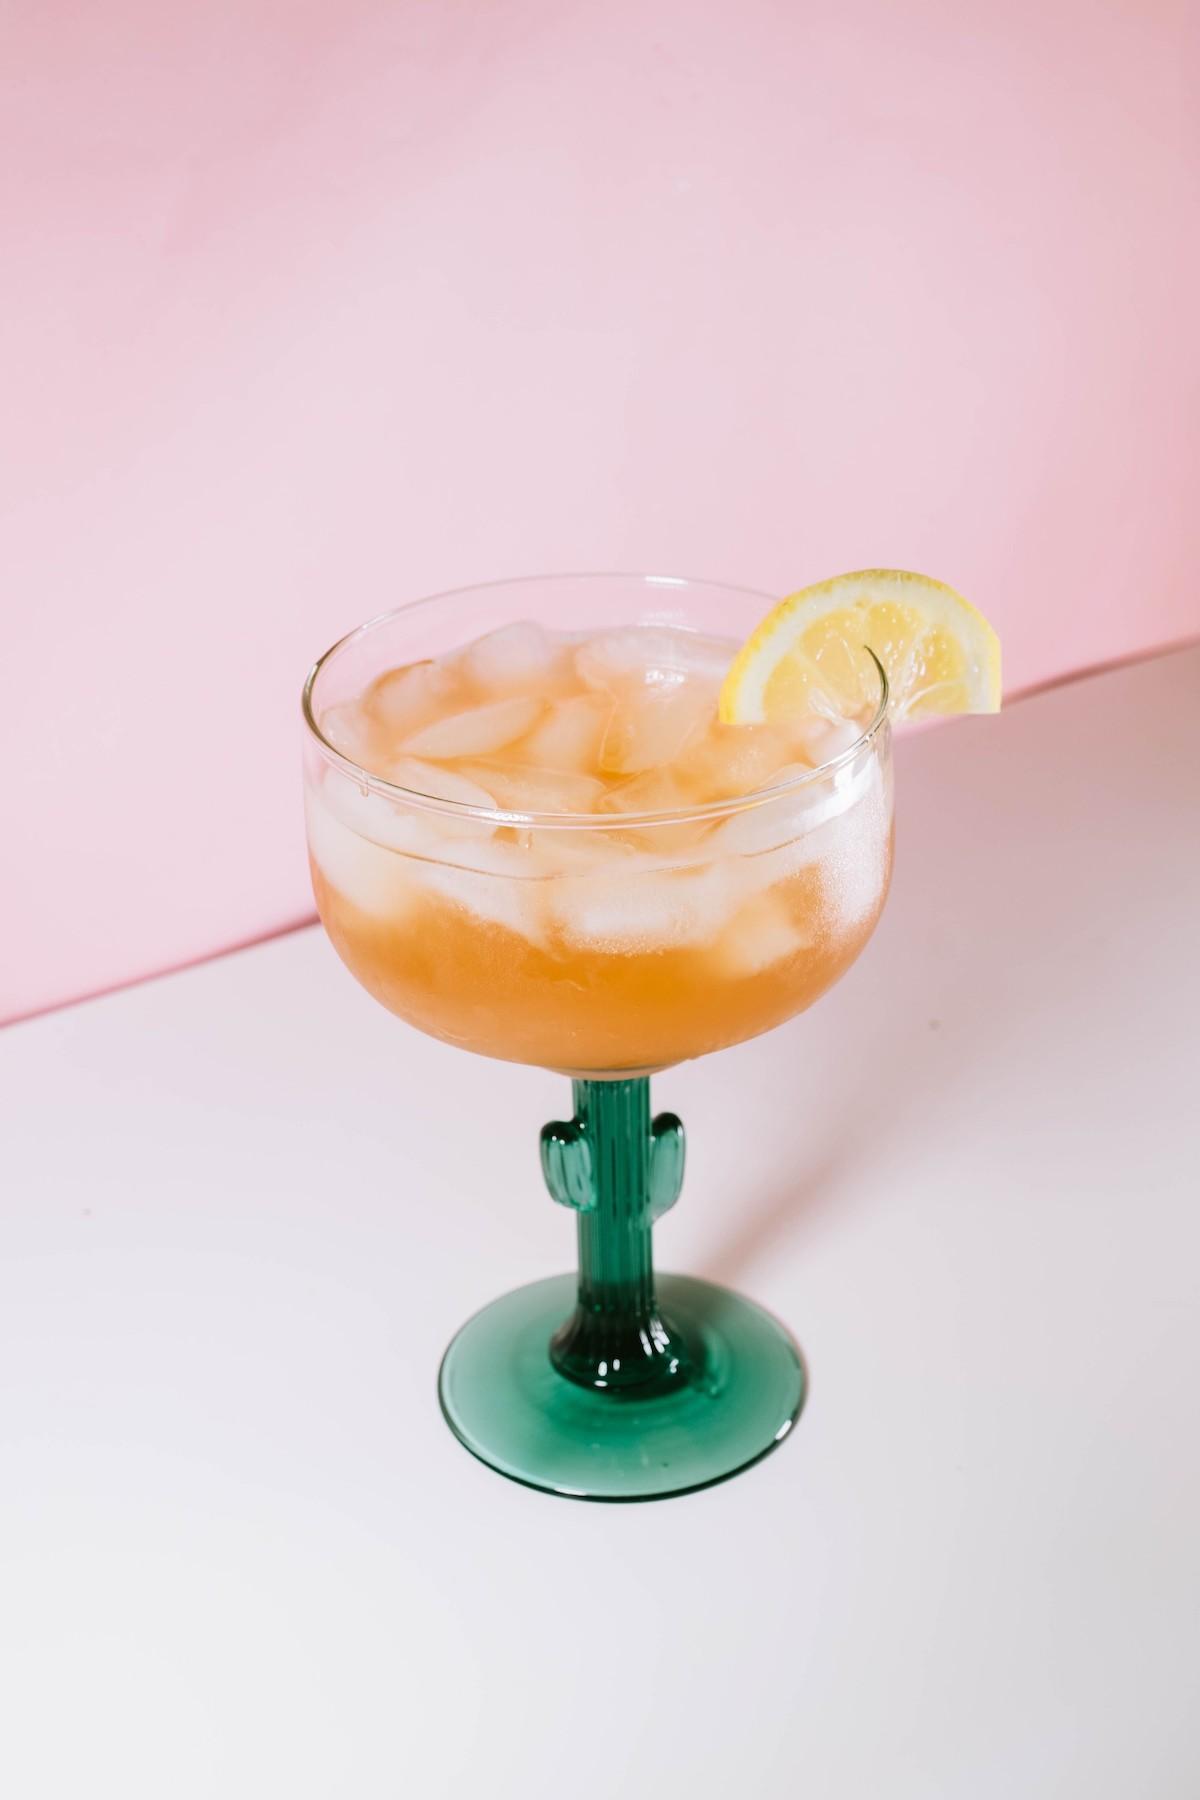 SOCO_Rich Elixirs- Grapefruit & Hops